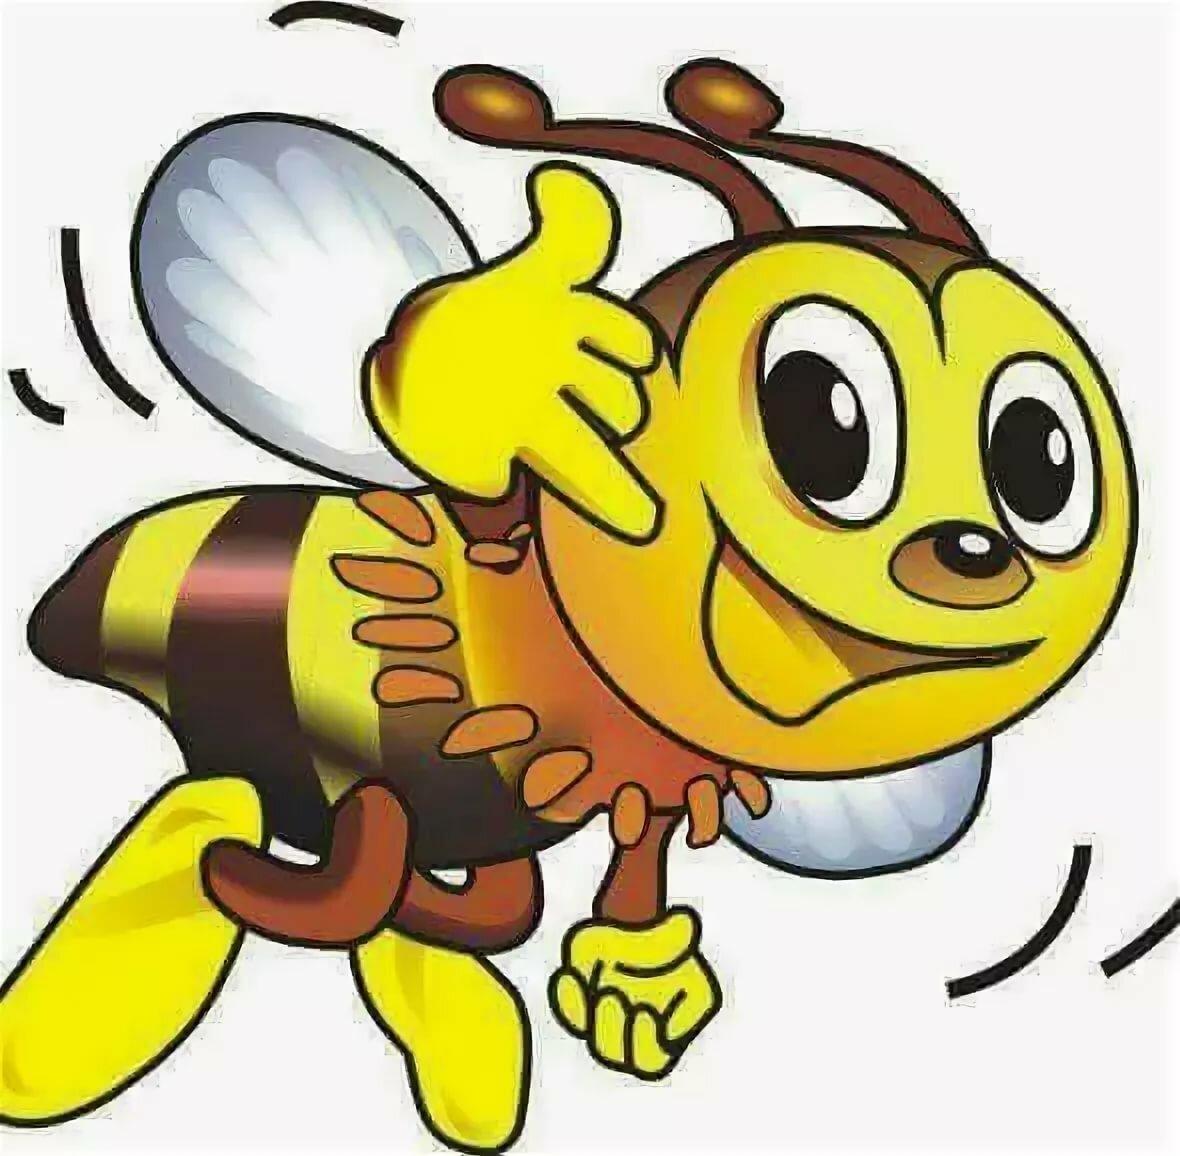 Картинки веселые про пчел, картинках стихах